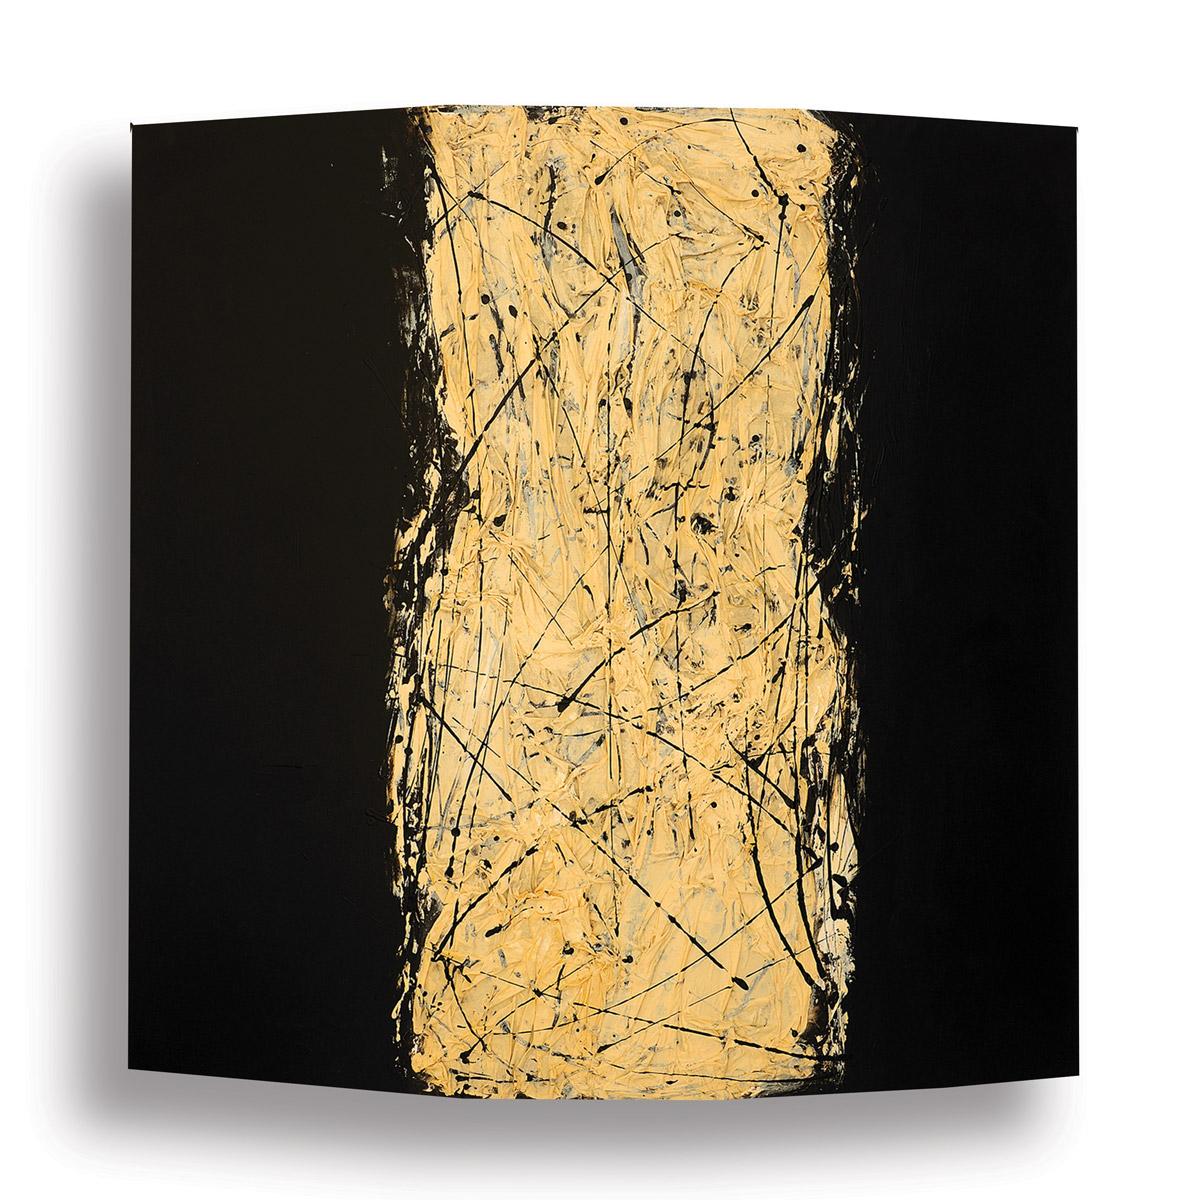 Black-with-White-Fabric_168-x-168-cm_Mixed-media-on-canvas_2010 rashid al khalifa